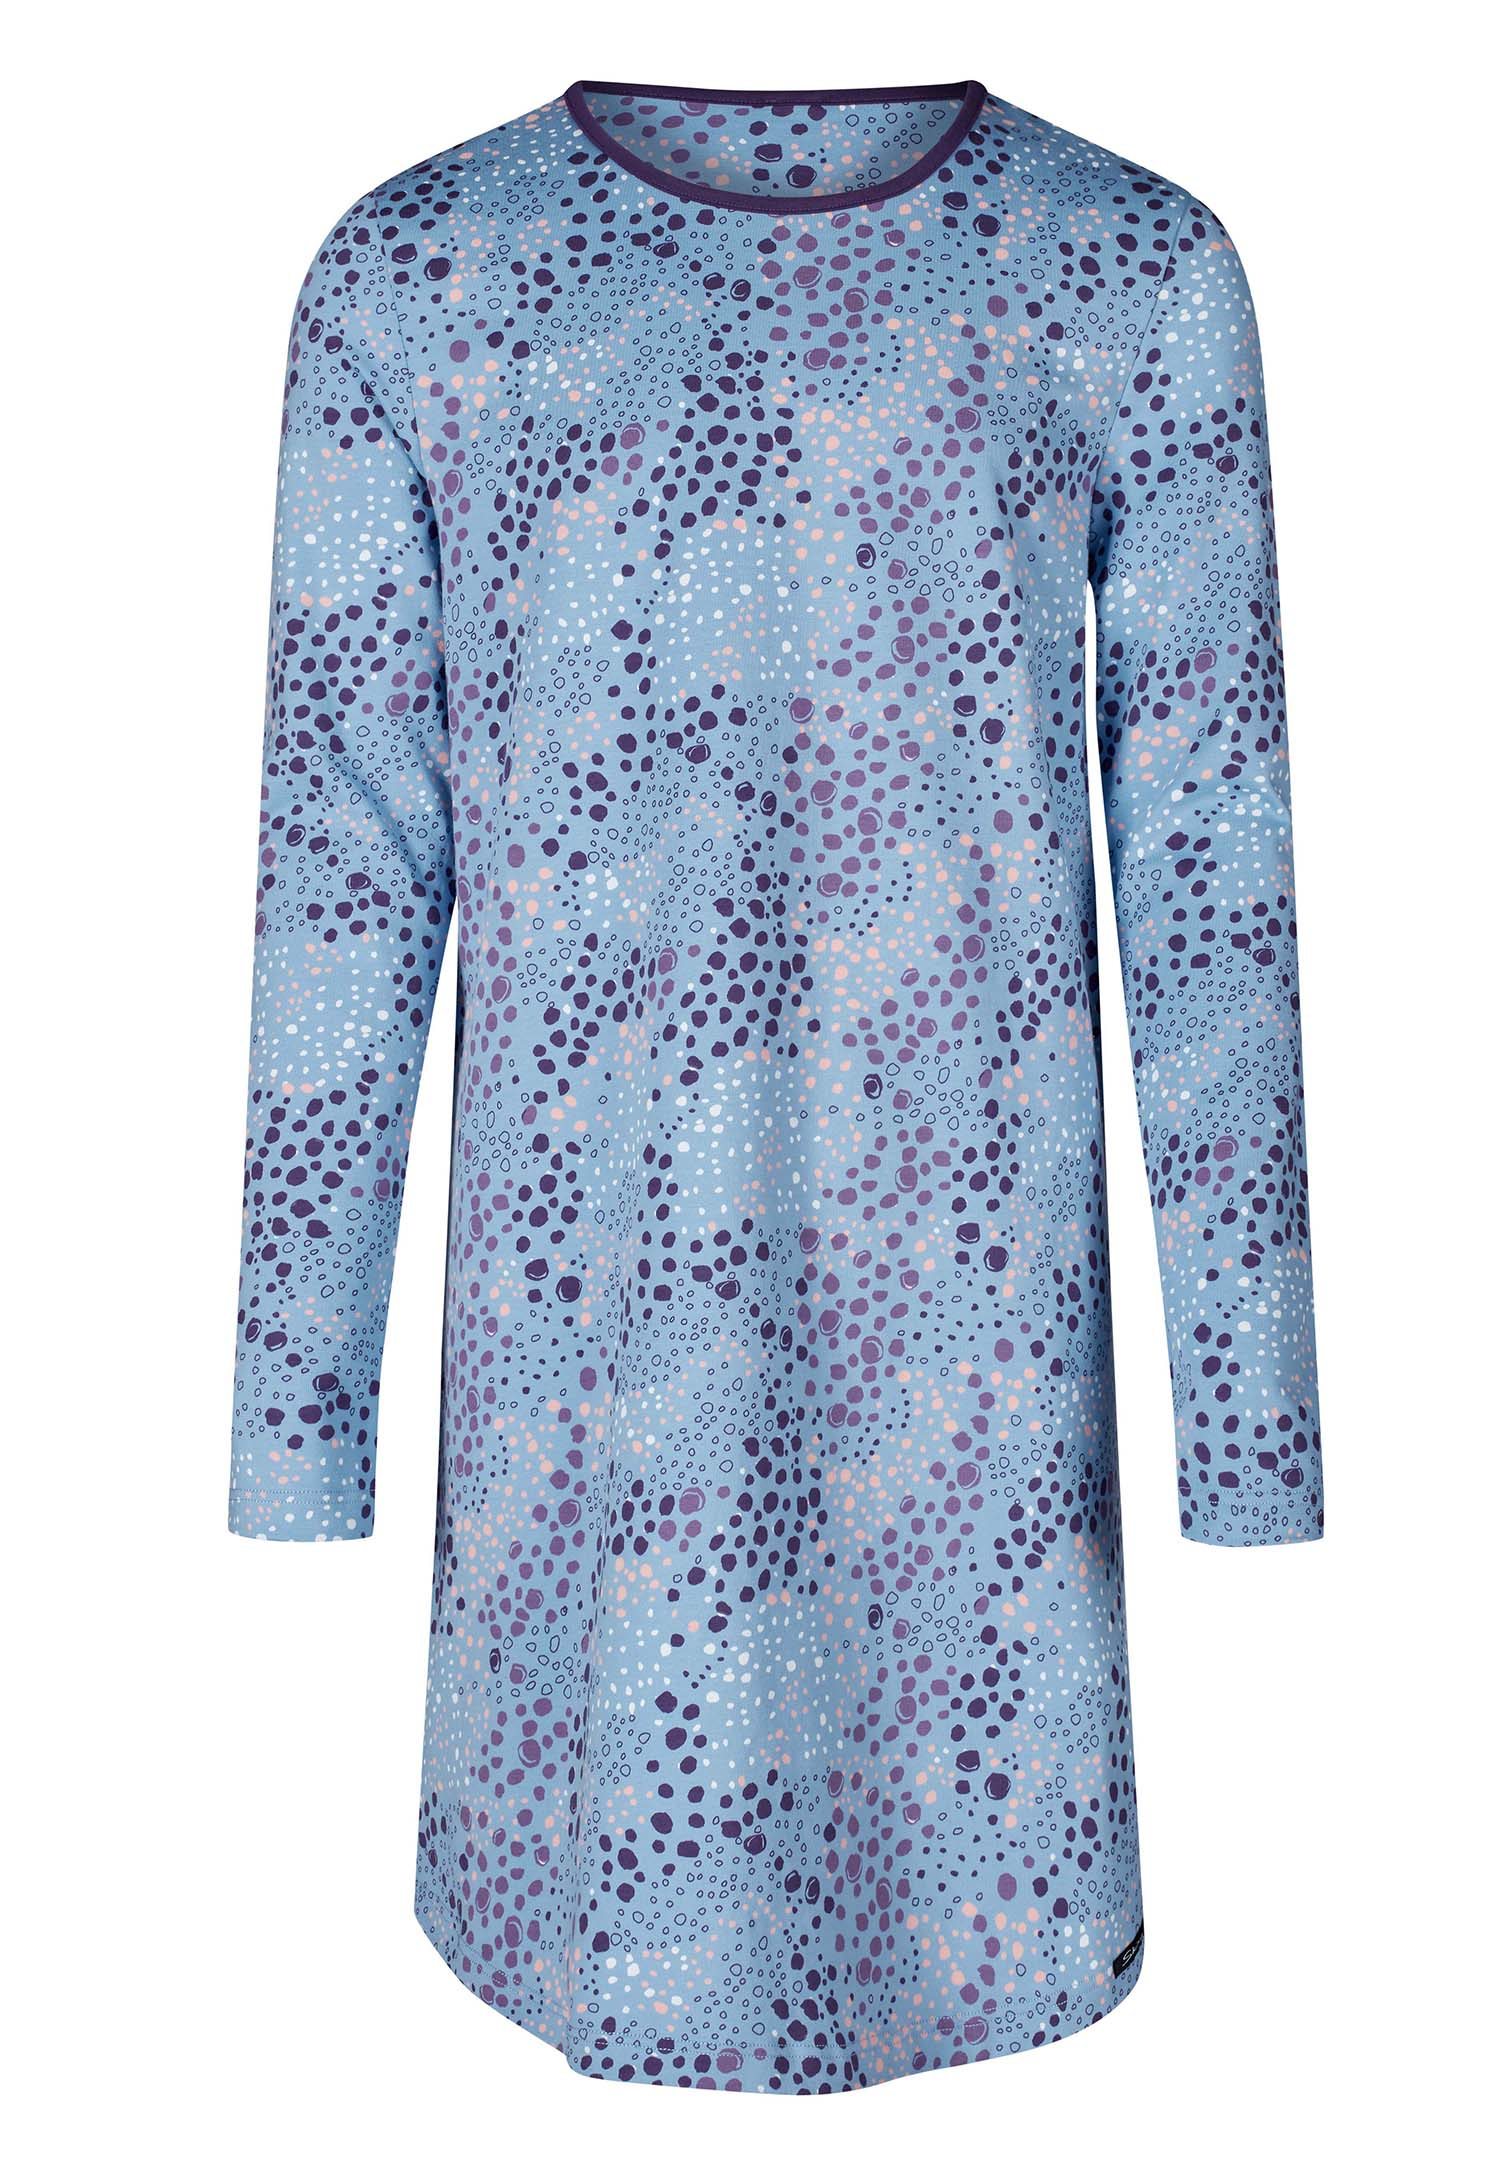 Skiny Nachthemd in lässigem Leo-Print Cosy Night Sleep